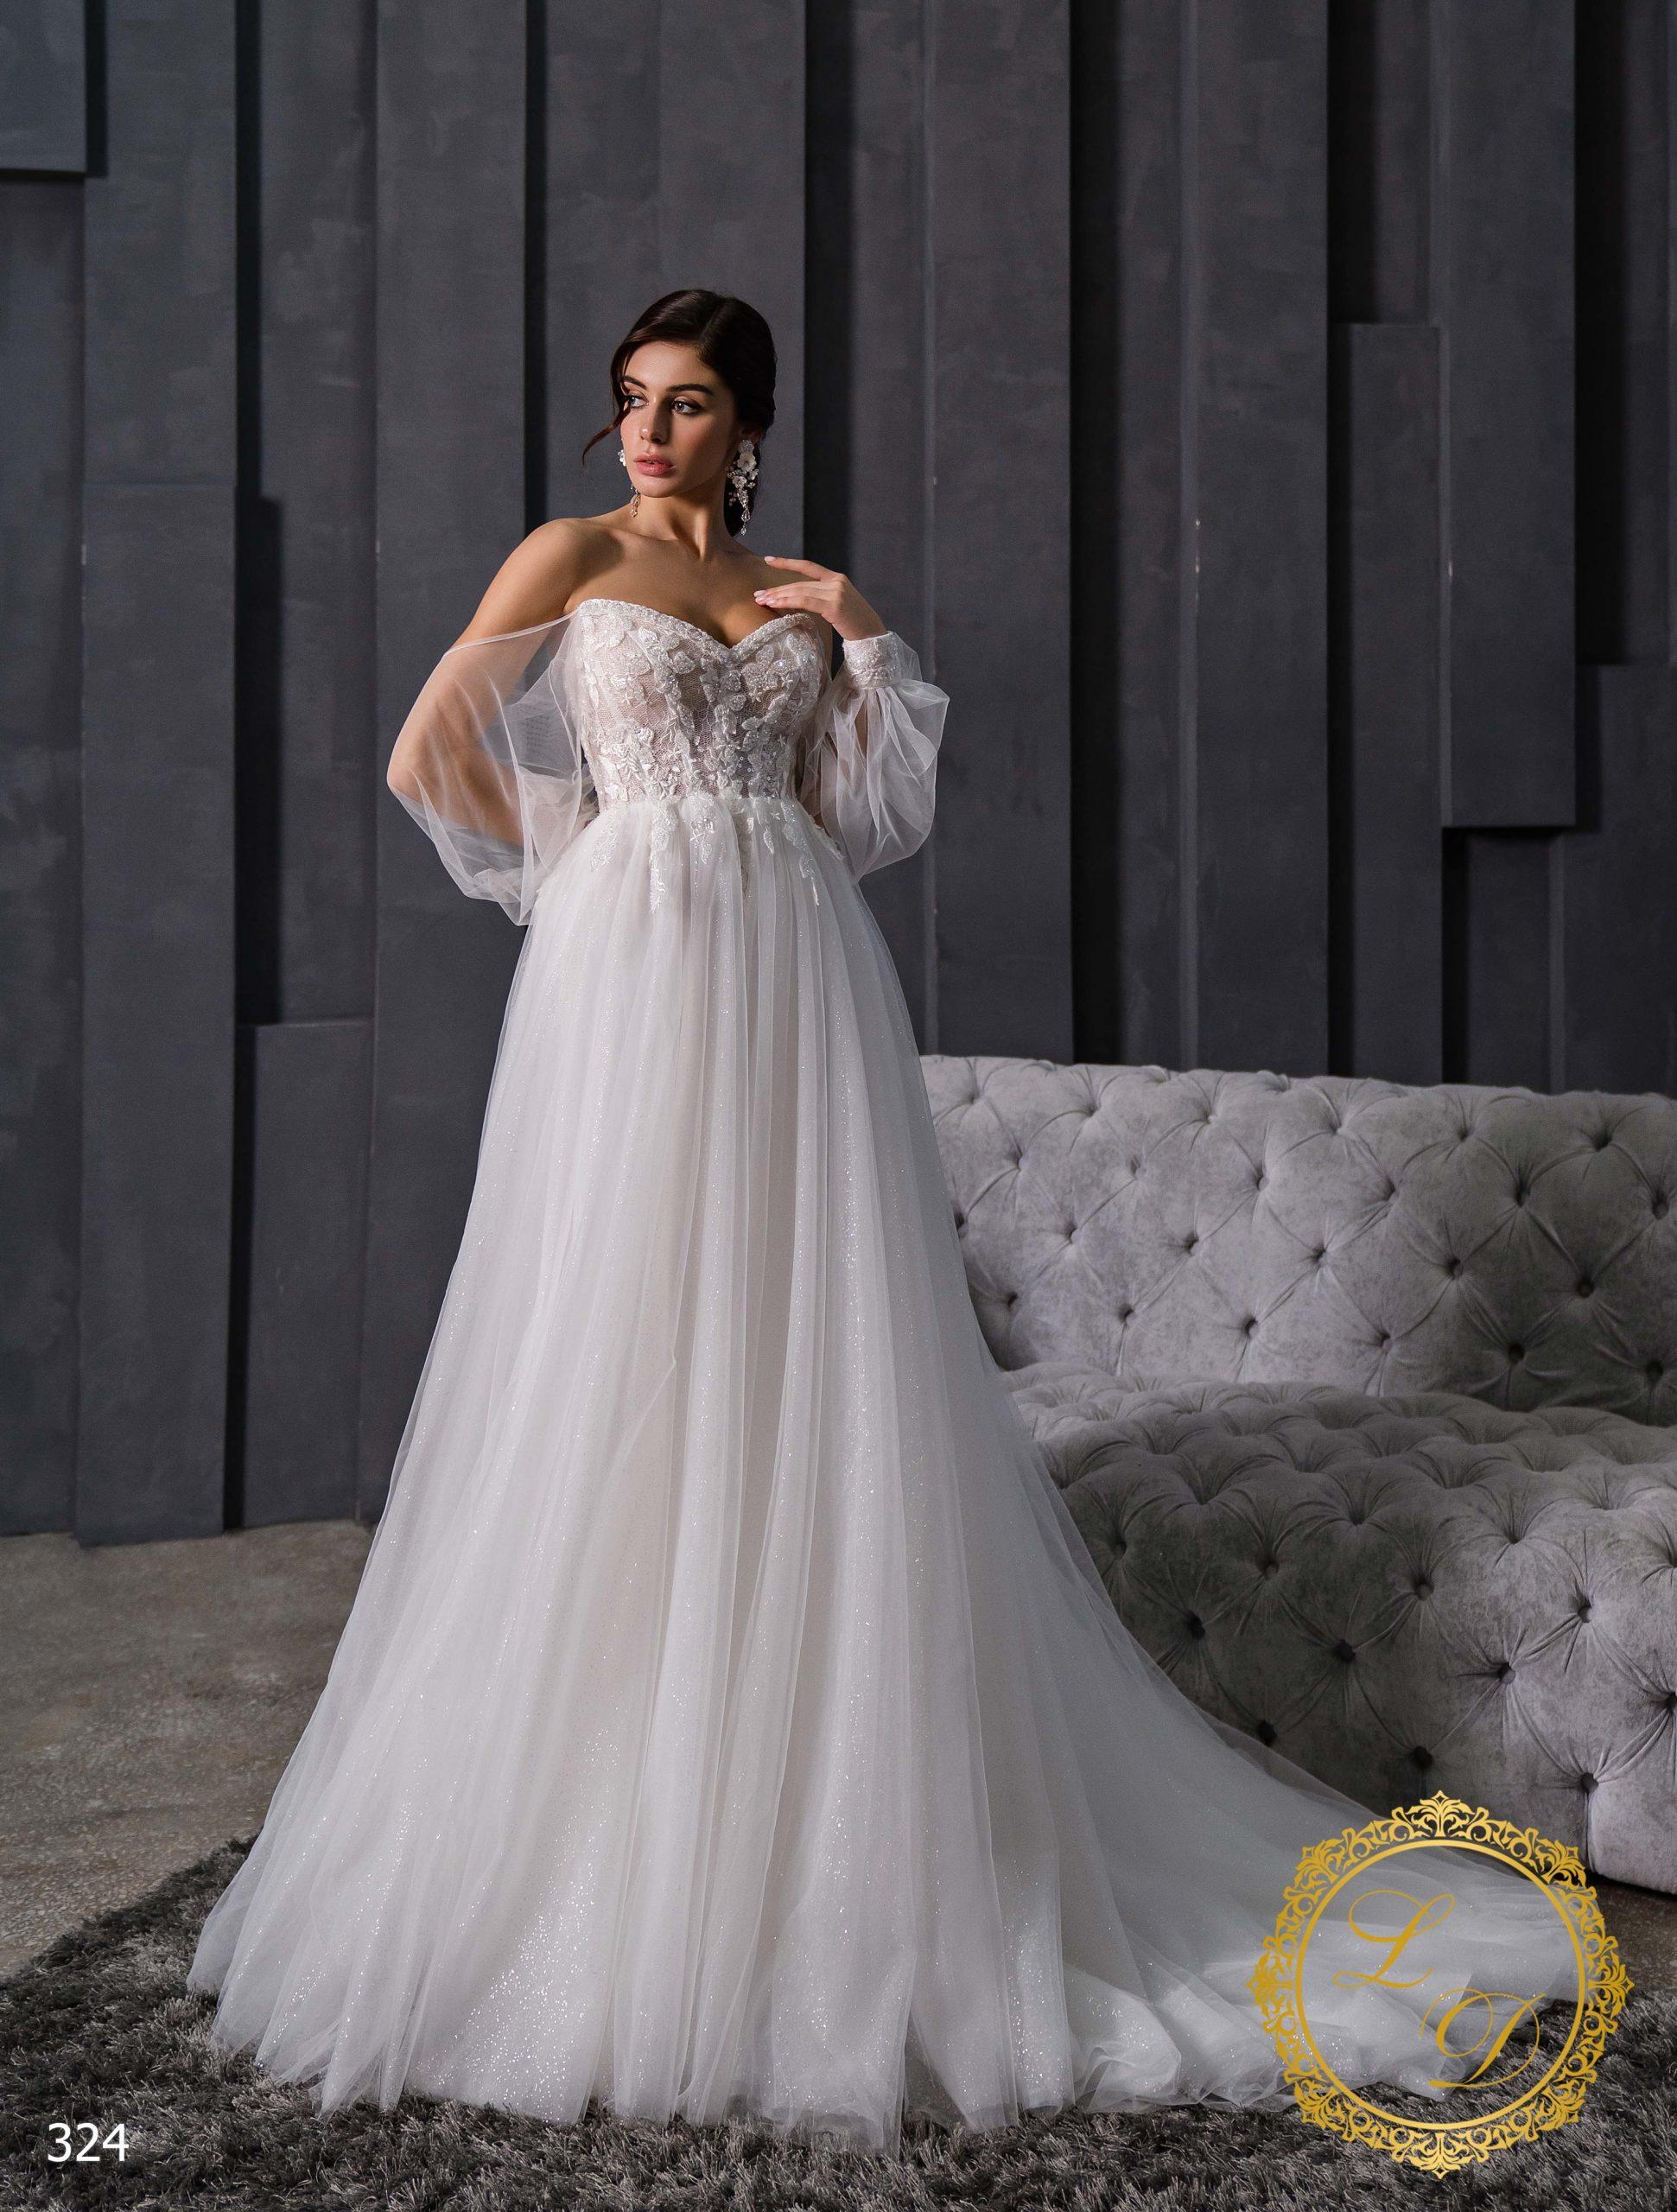 Wedding Dress Lady Di 324